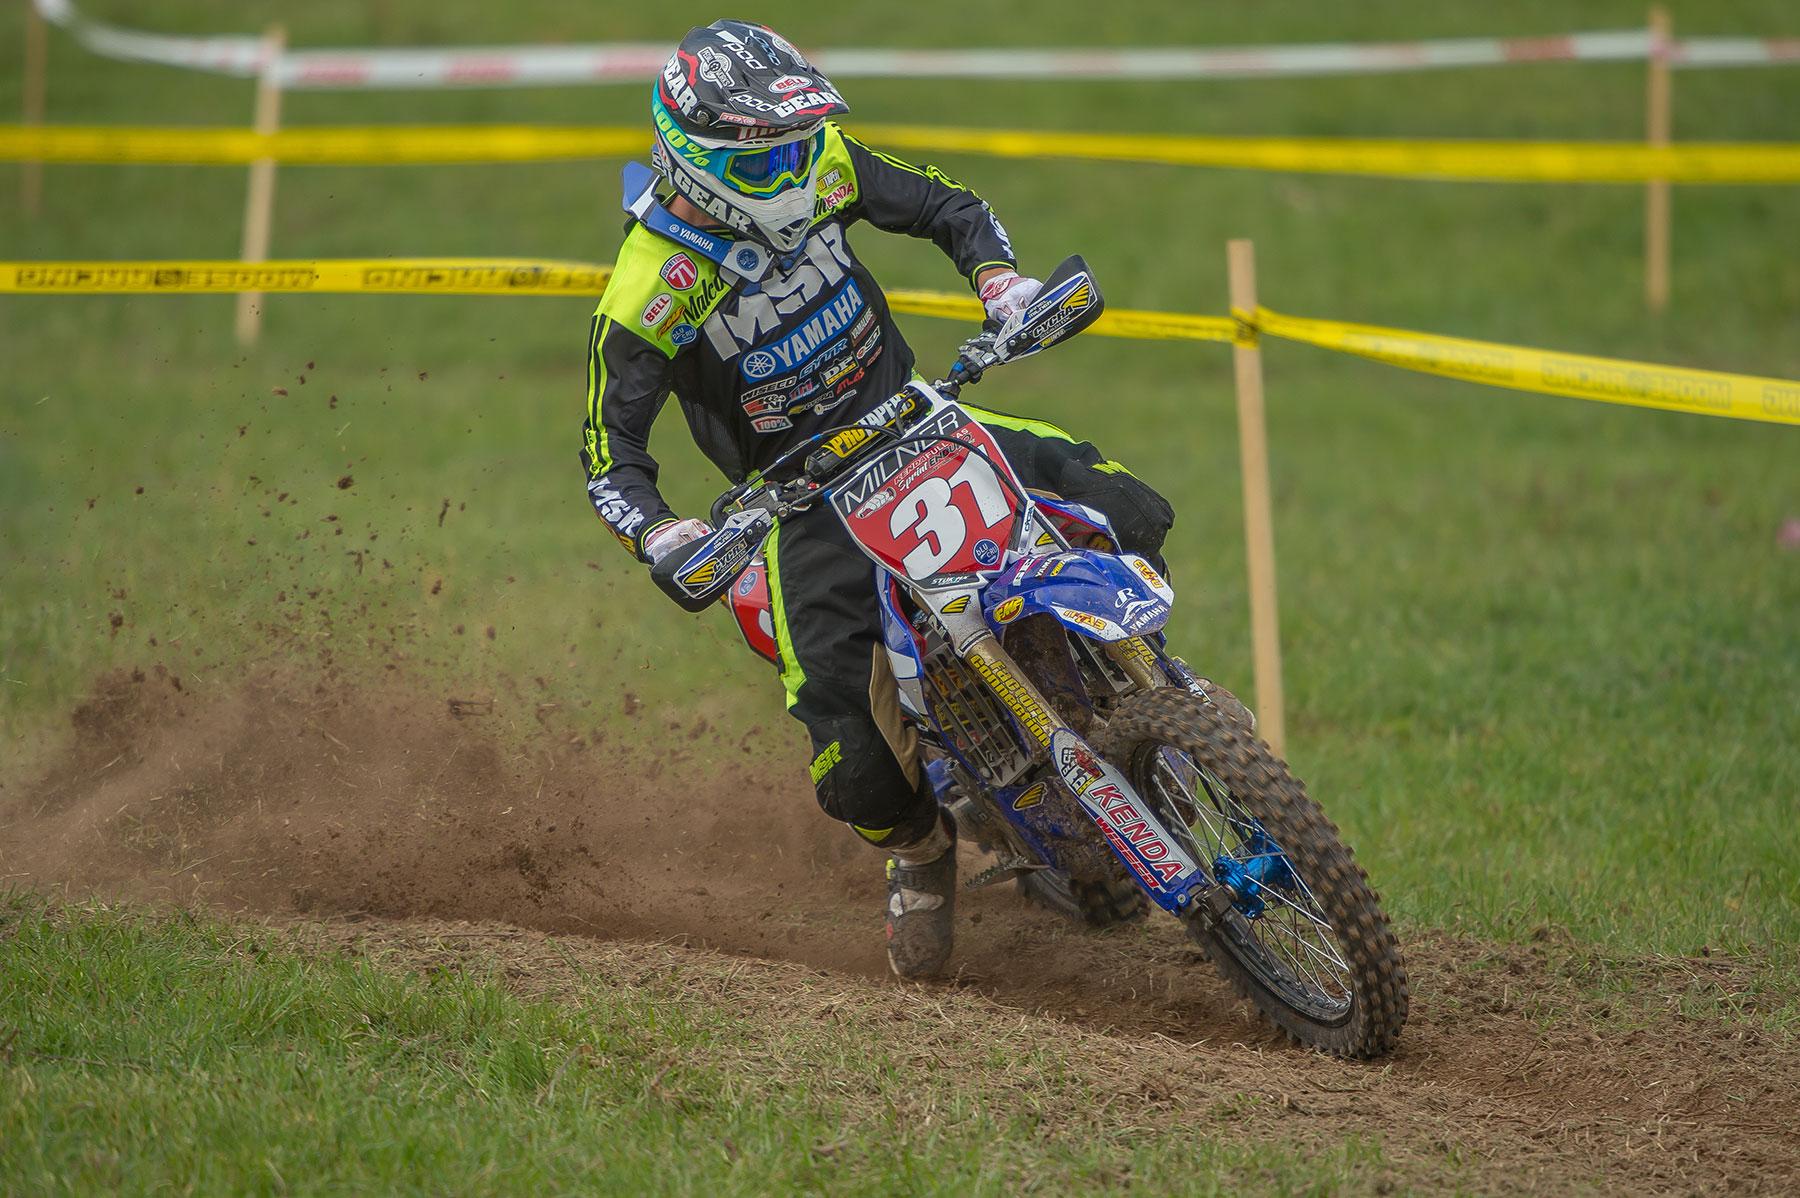 Daniel Milner was 2nd. Photo by Shan Moore.